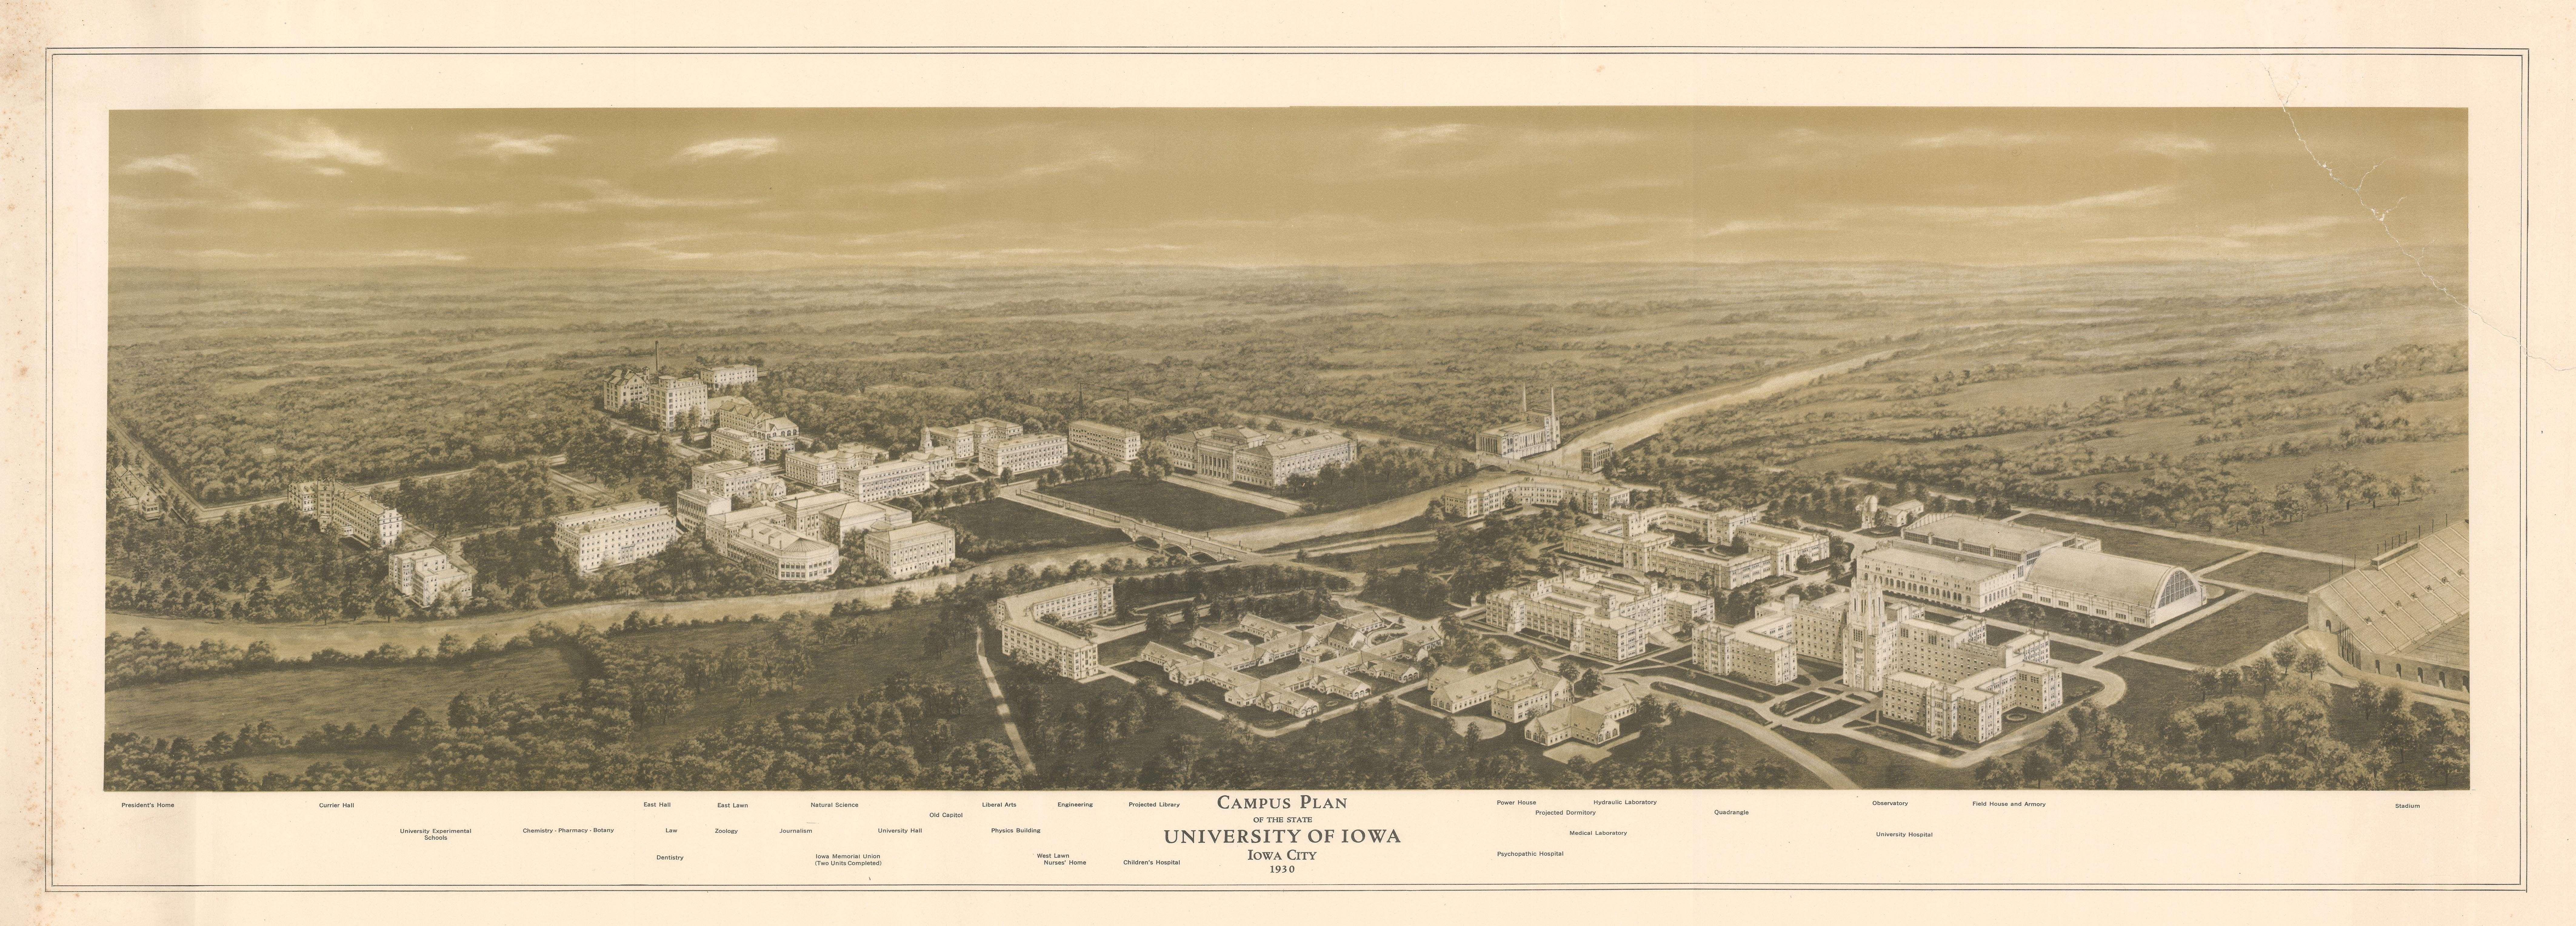 The University of Iowa, 1930